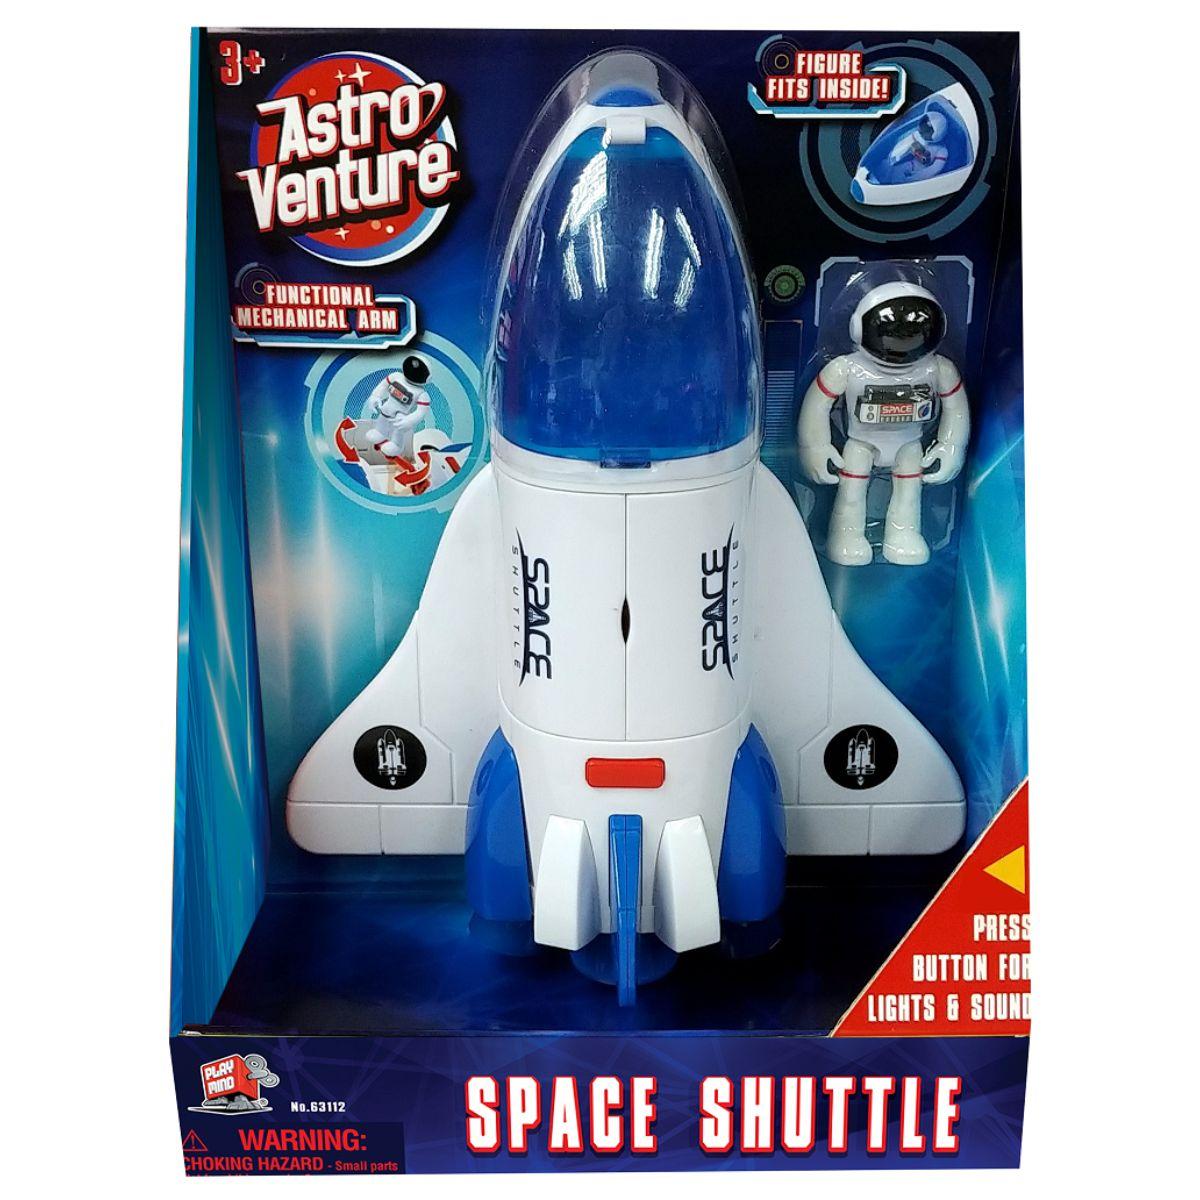 Naveta spatiala si figurina astronaut Astro Venture